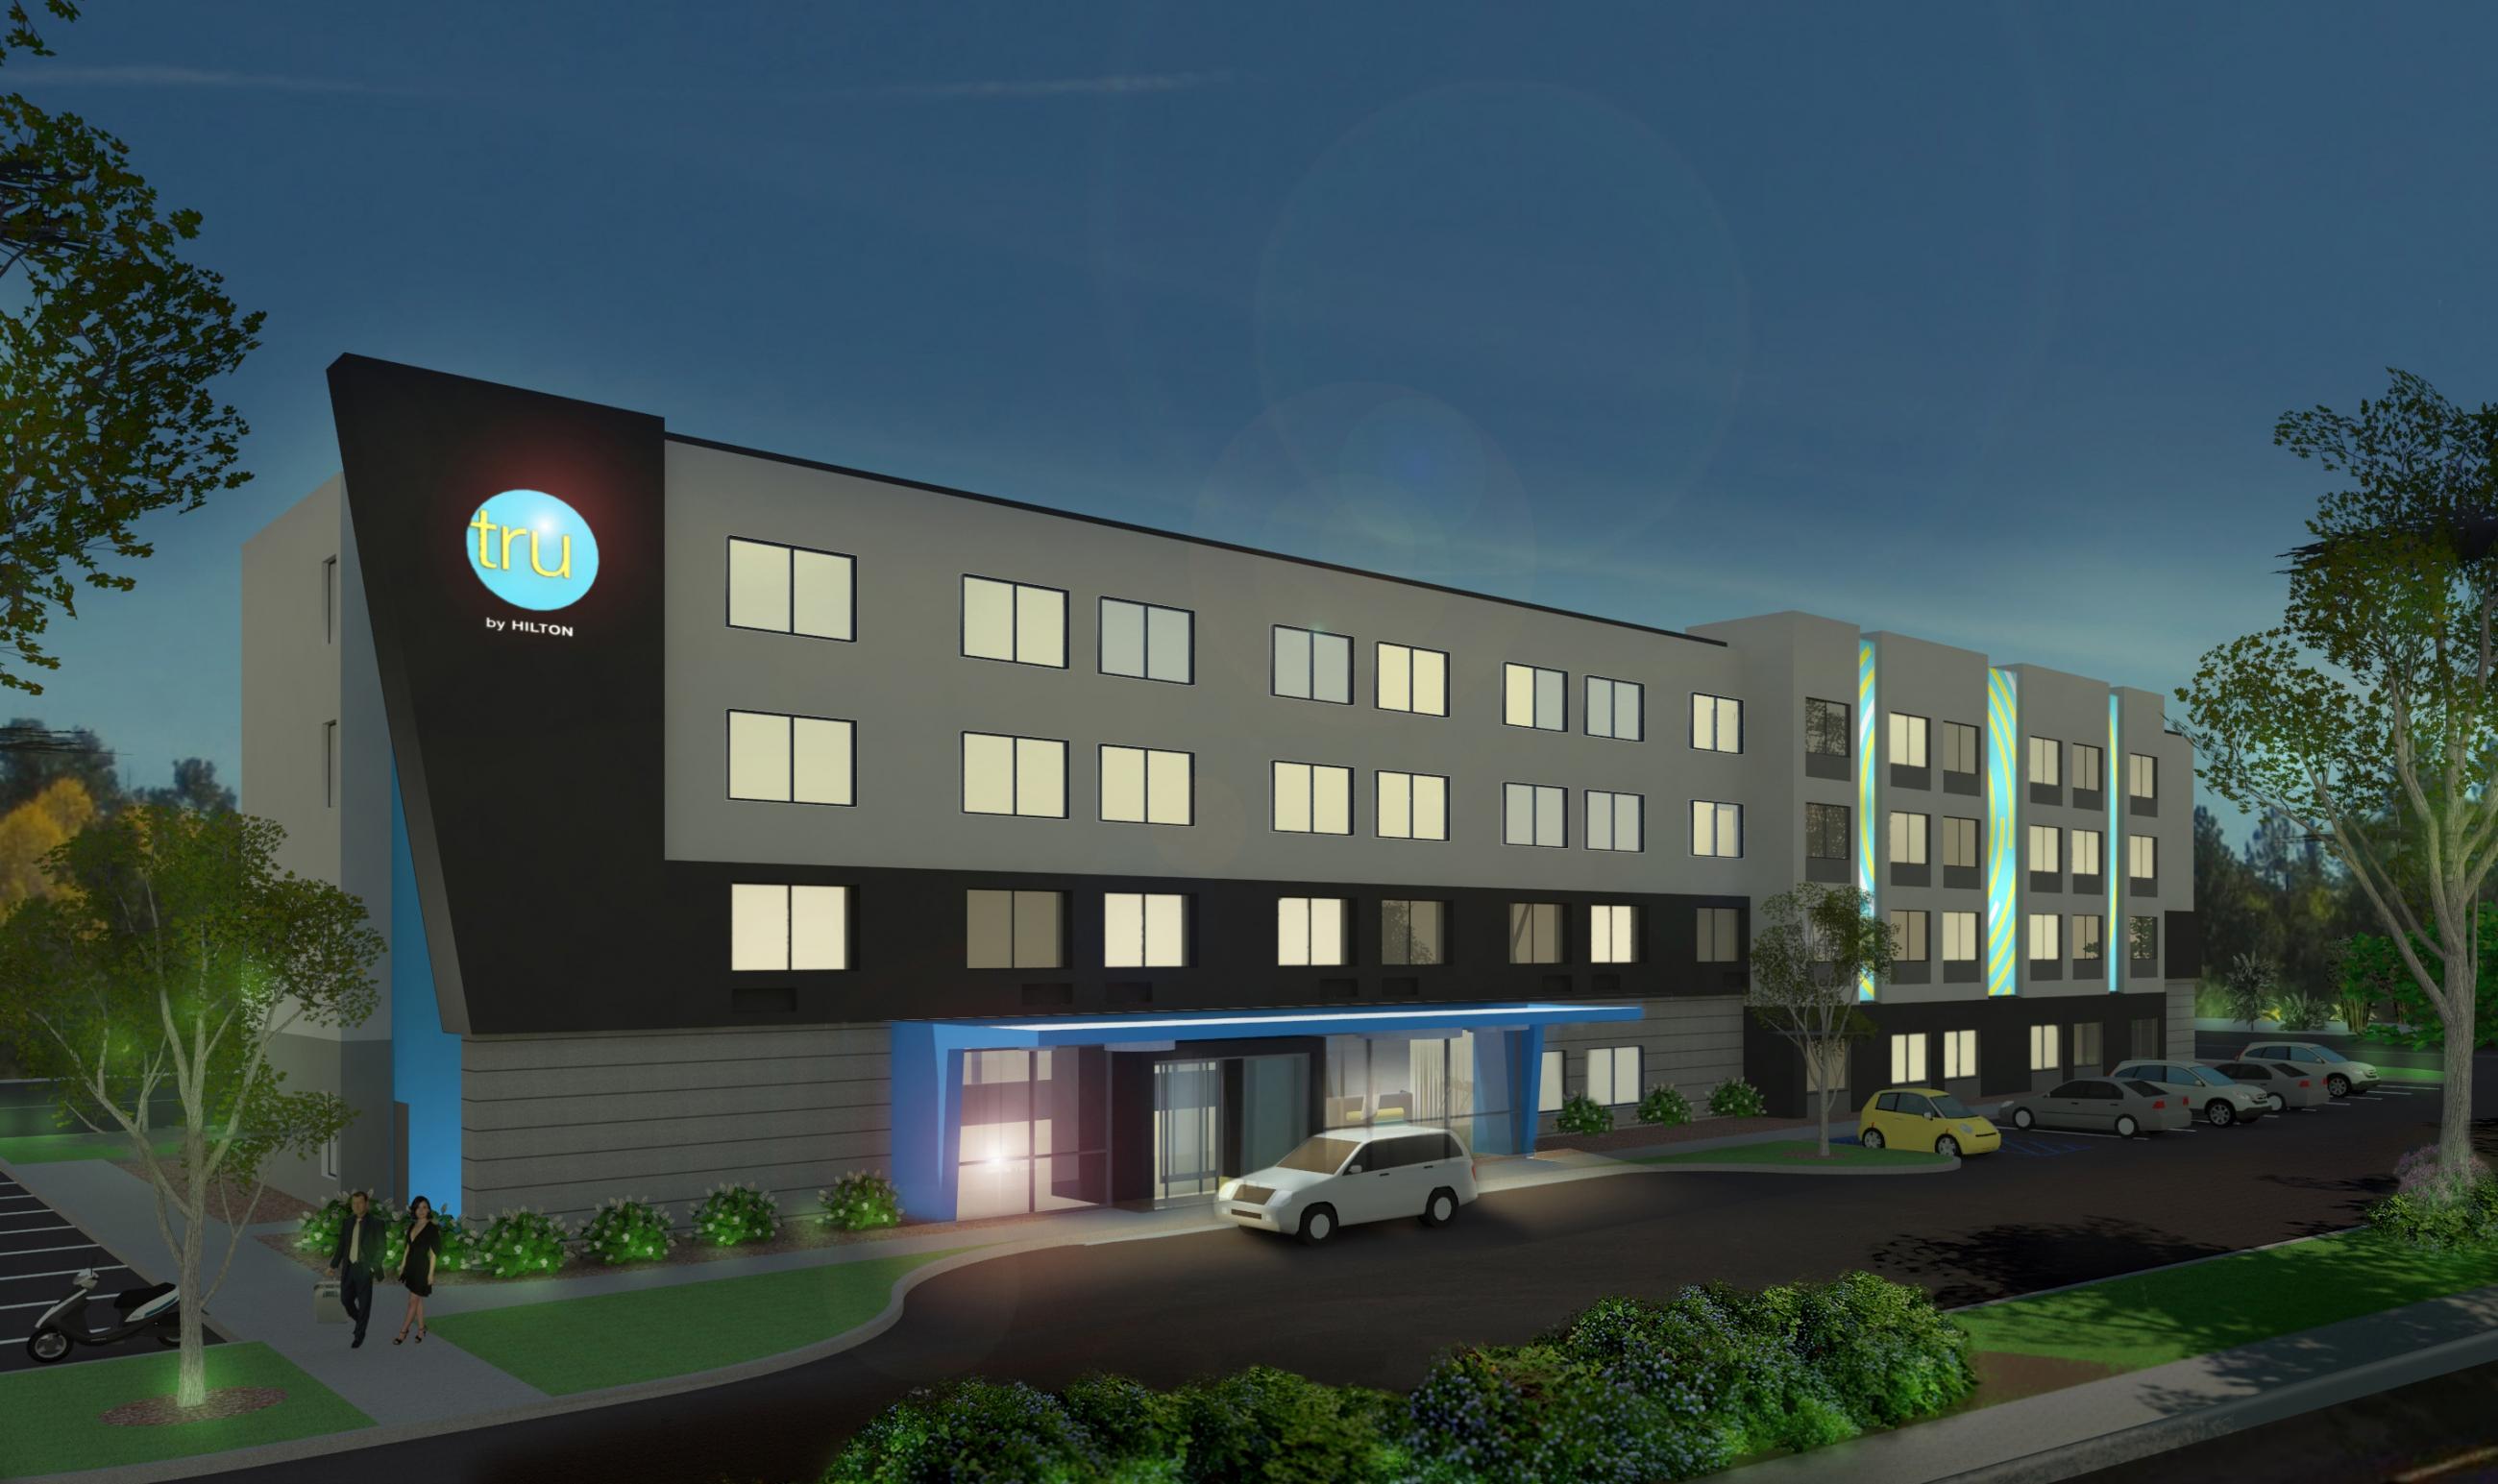 Hilton Starts Development on 10 Tru Hotels